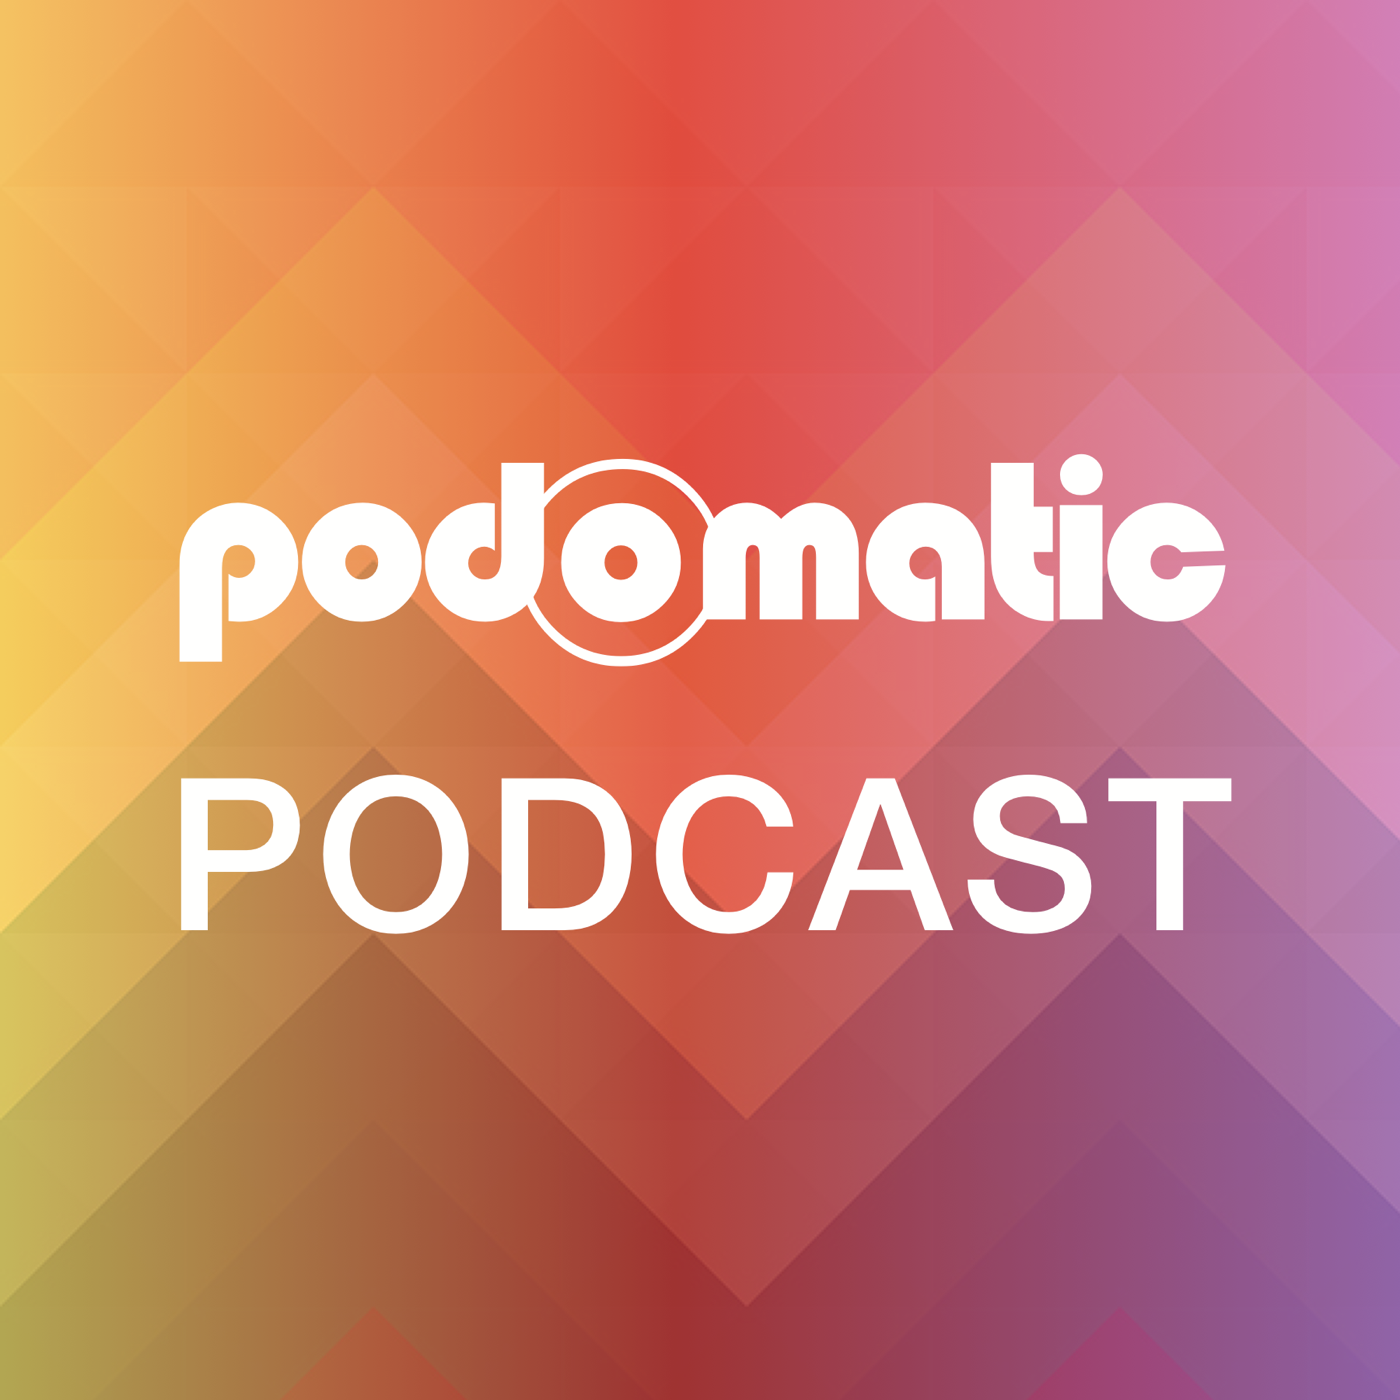 Saint Edward's Cambridge's Podcast